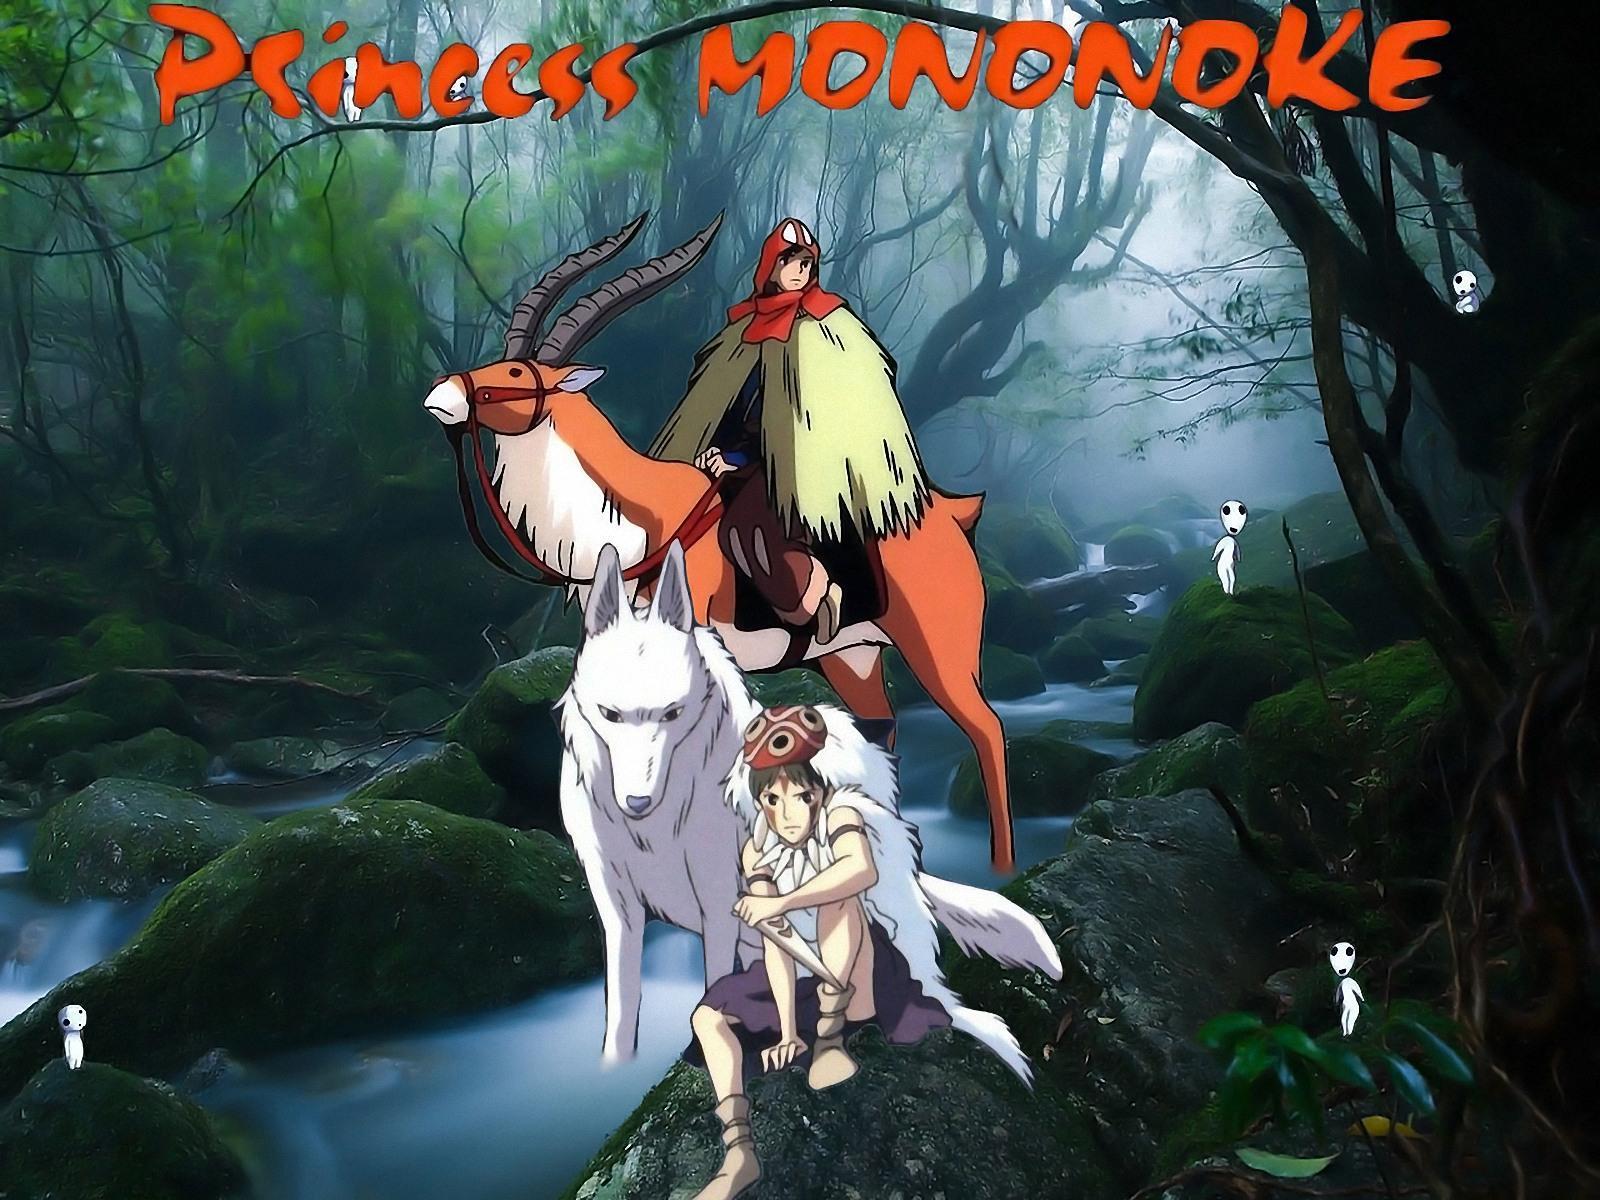 Princess mononoke 4 cool wallpaper - Mononoke anime wallpaper ...